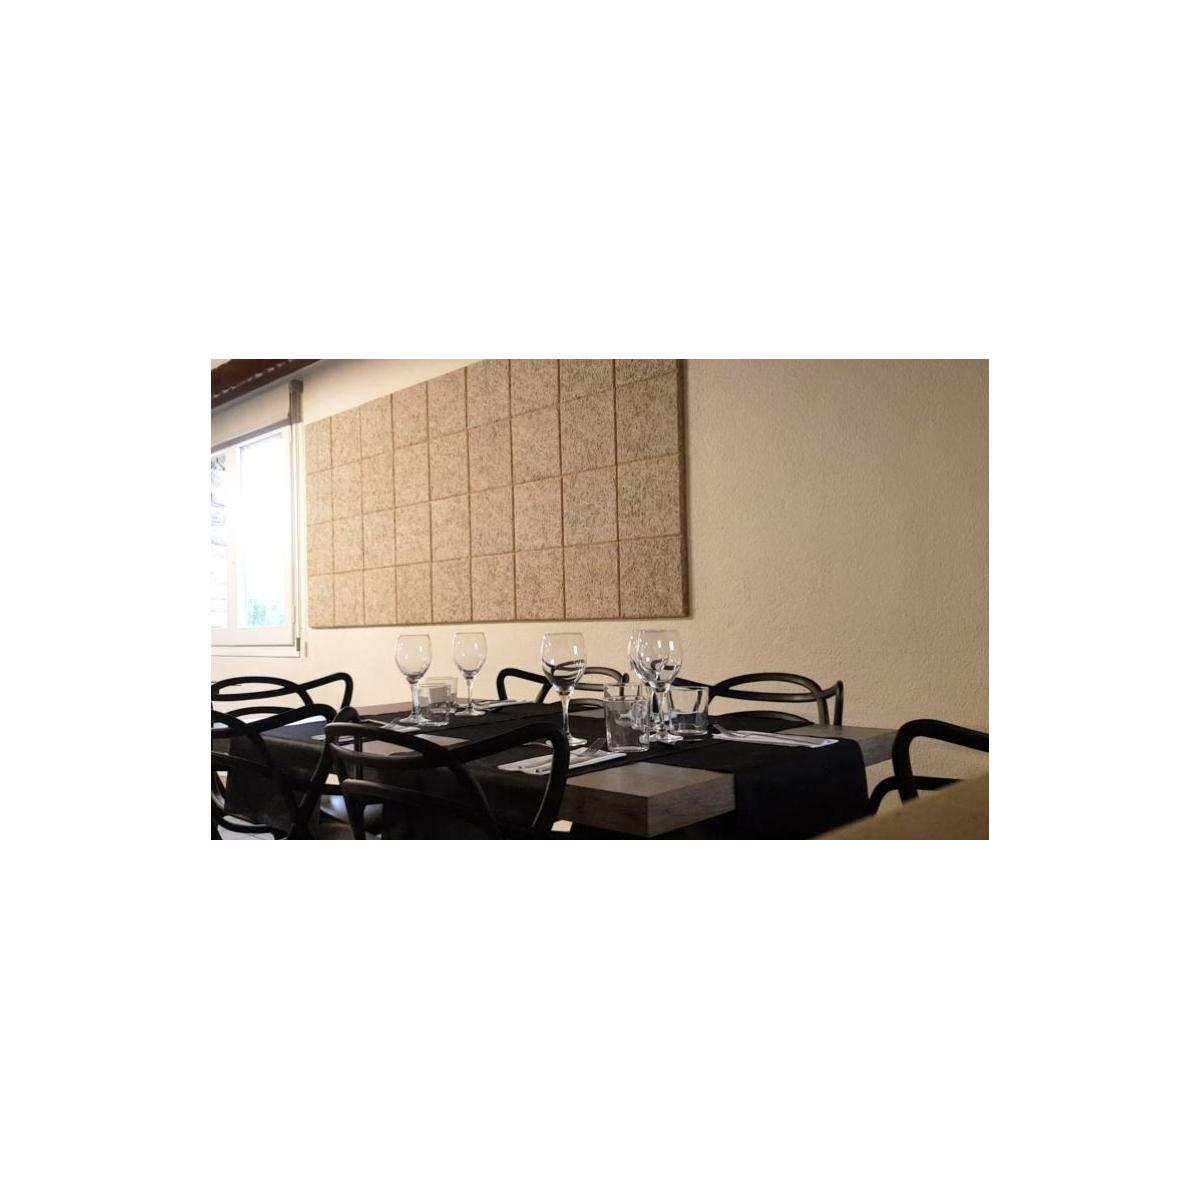 Comprar online Panel acústico para paredes color gris medio